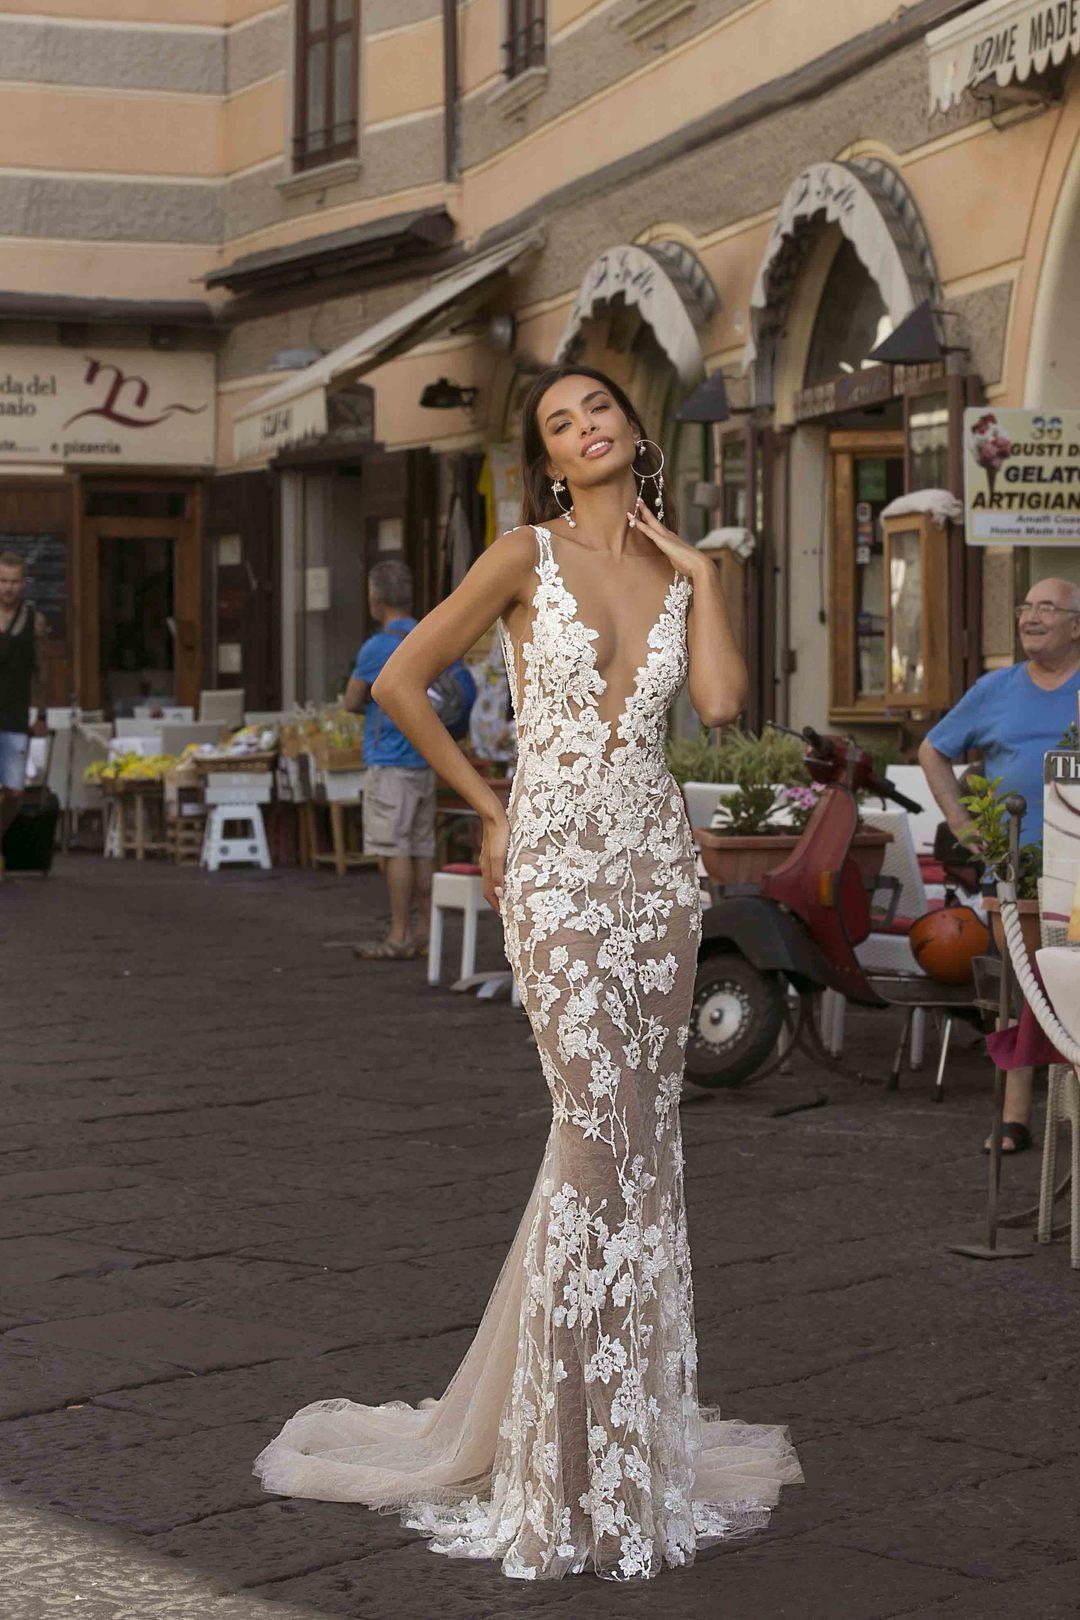 20-p110 dress photo